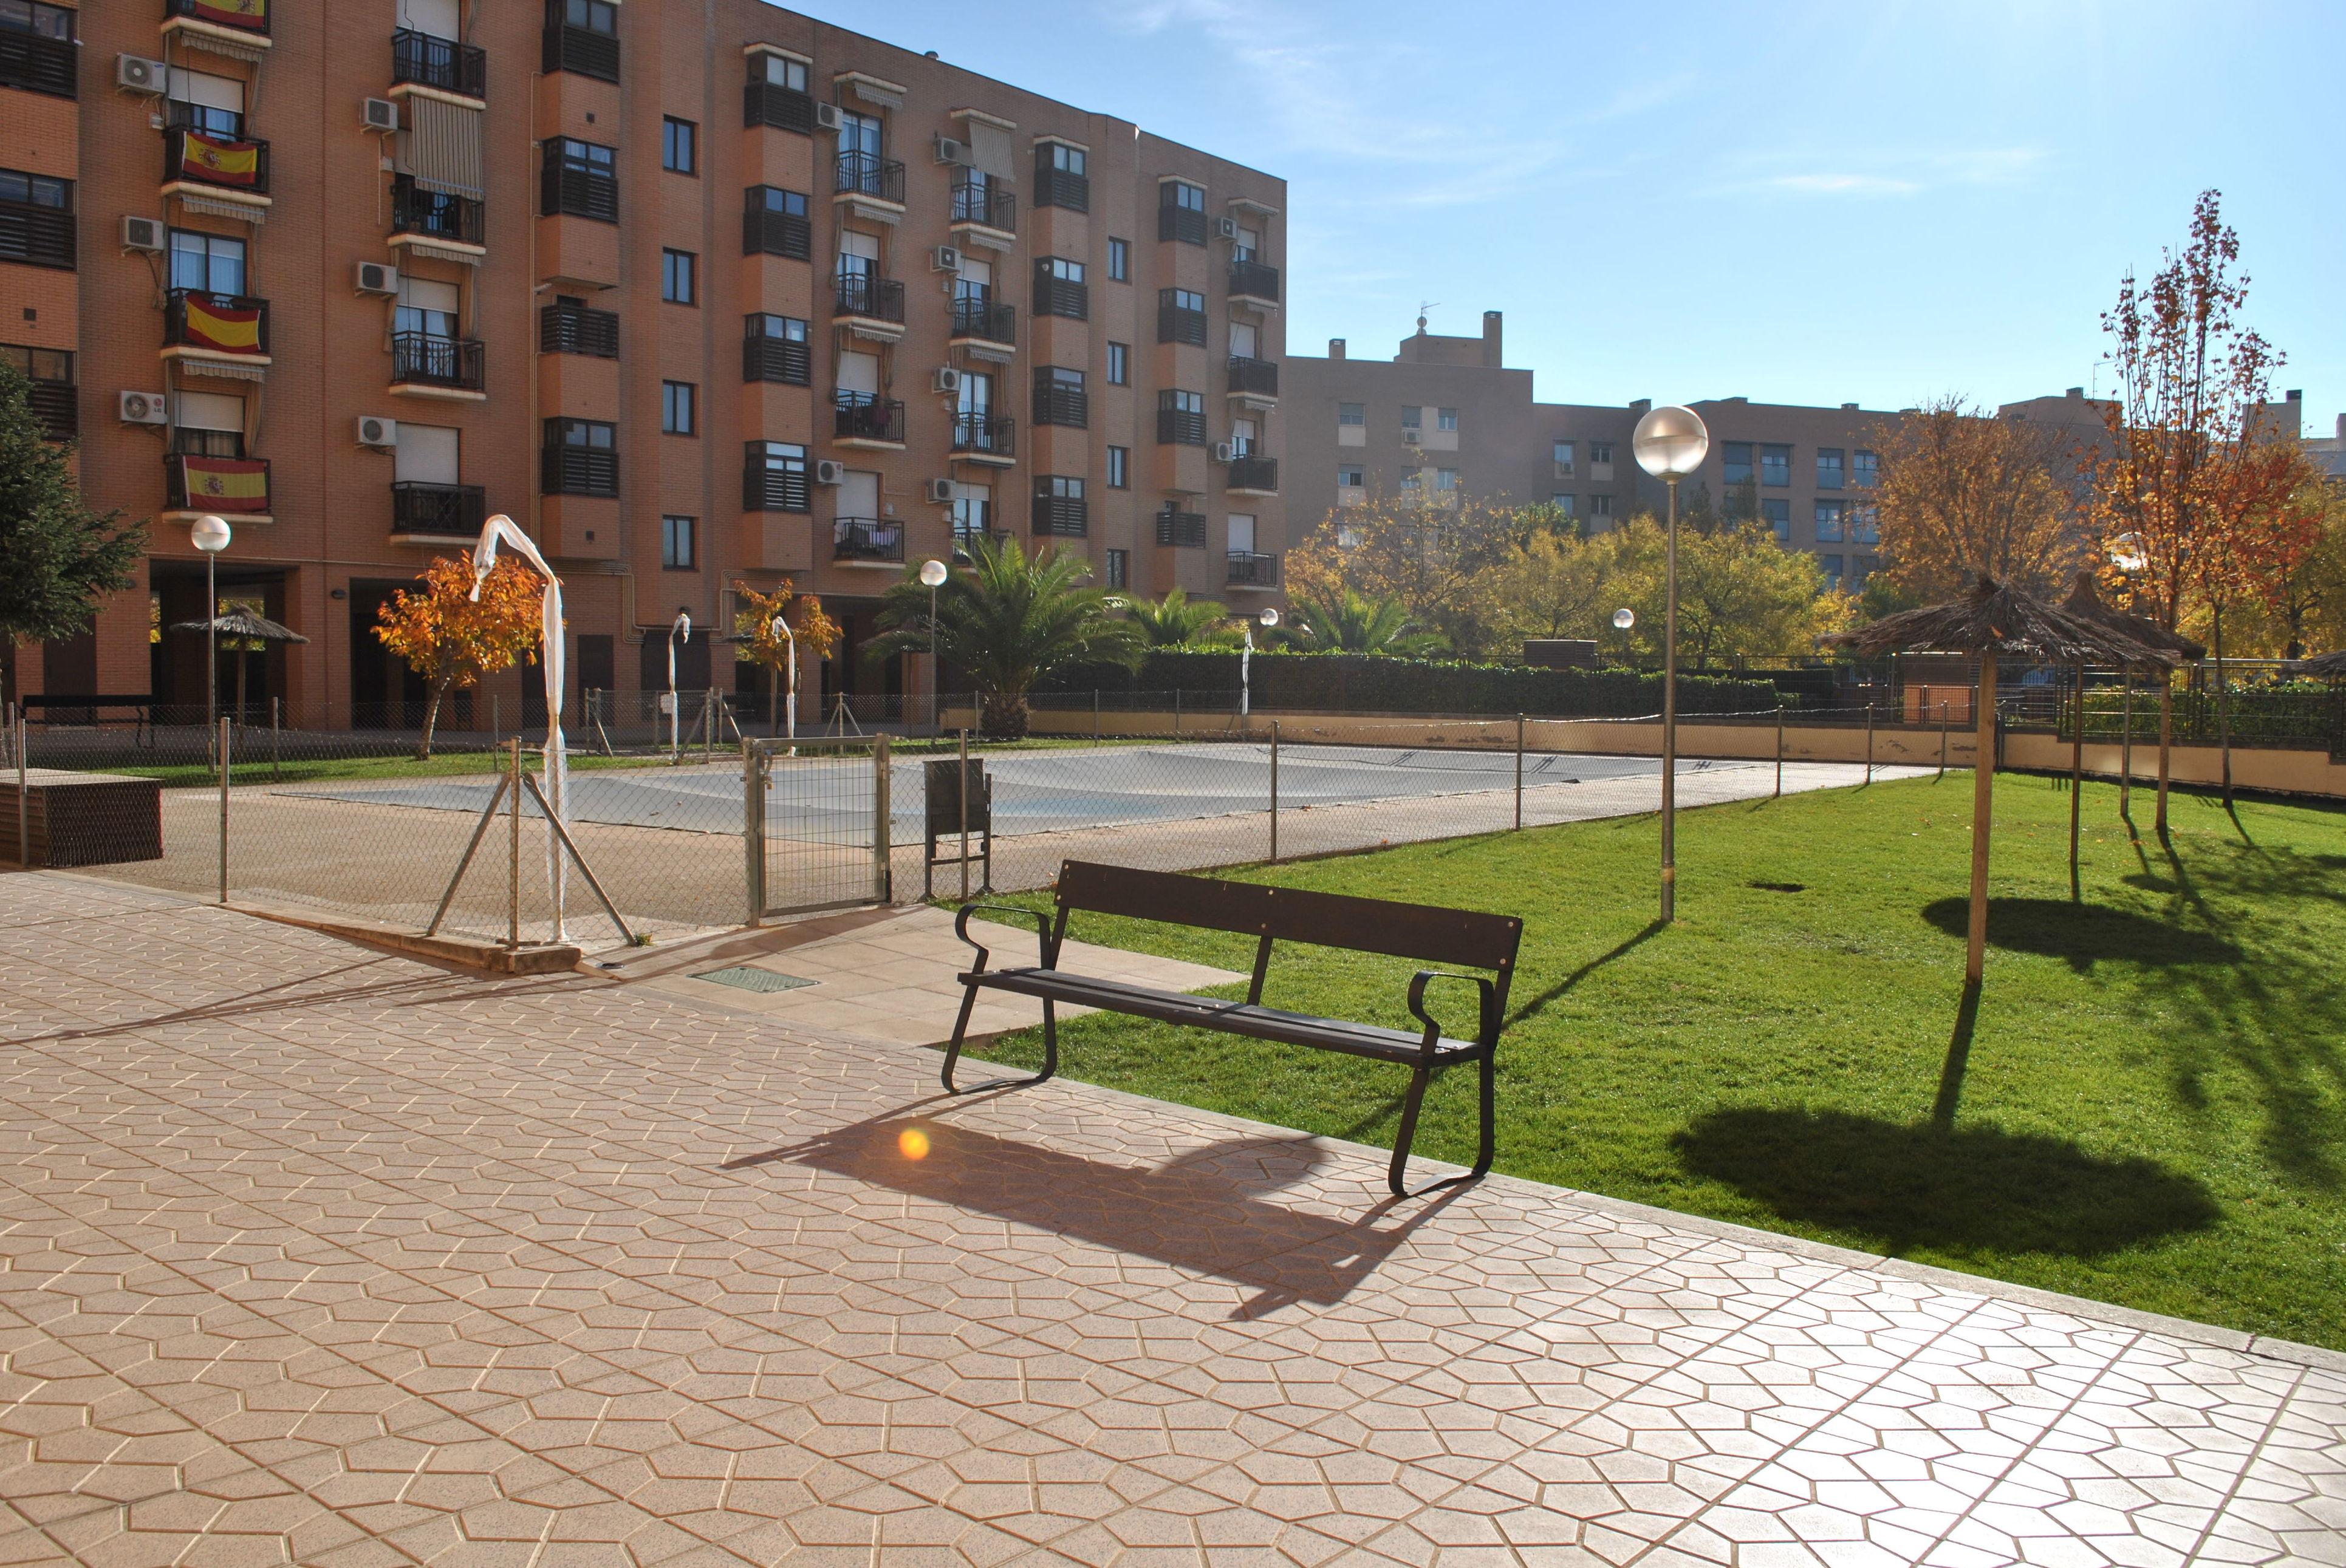 Piso en Torrejón de Ardoz Avenida de la Unión Europea: Propiedades de MoMa Team